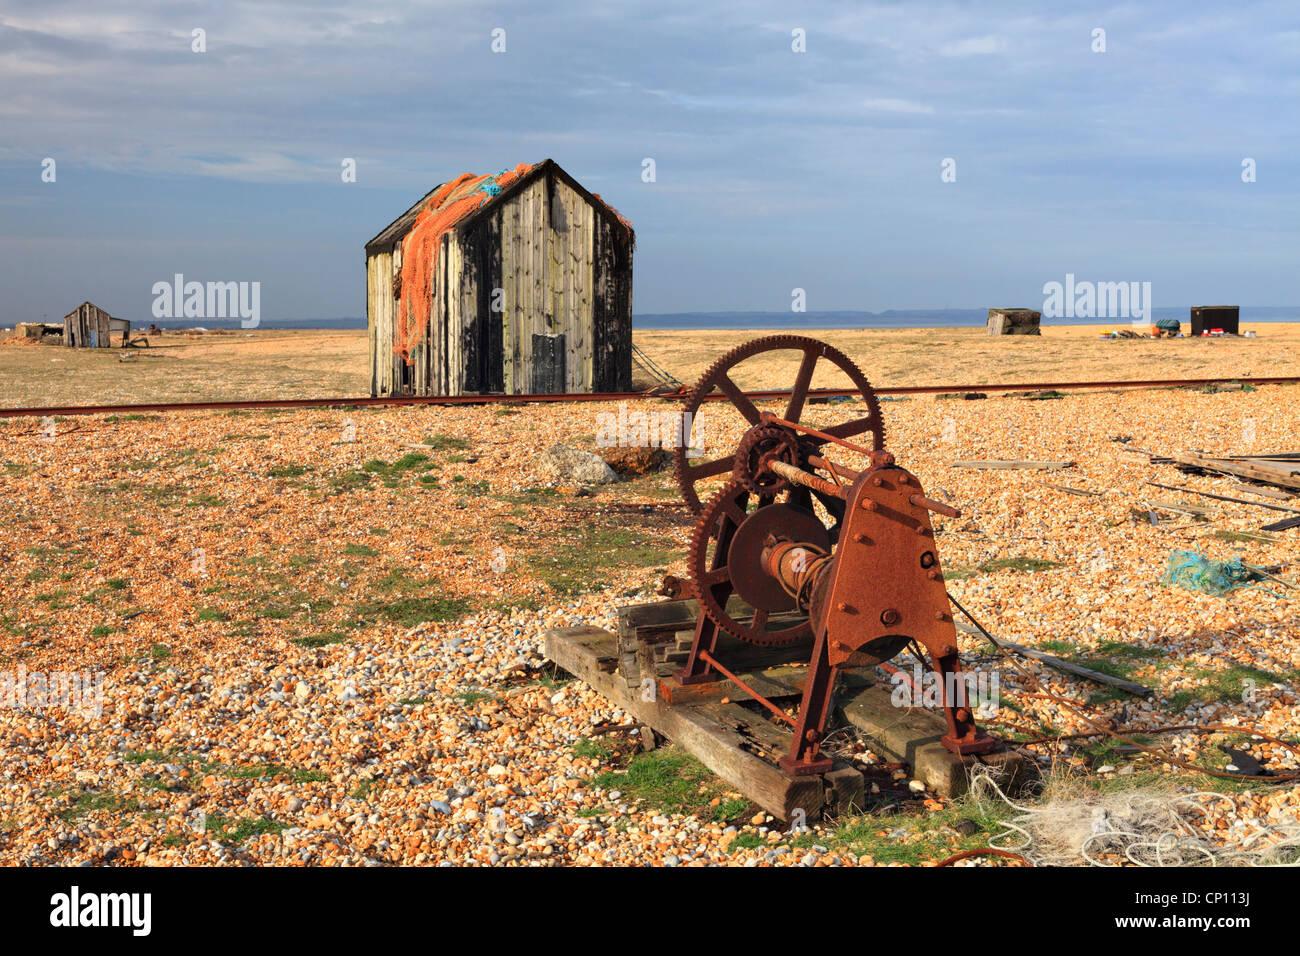 Macchinari abbandonati a Dungeness in west Kent Immagini Stock